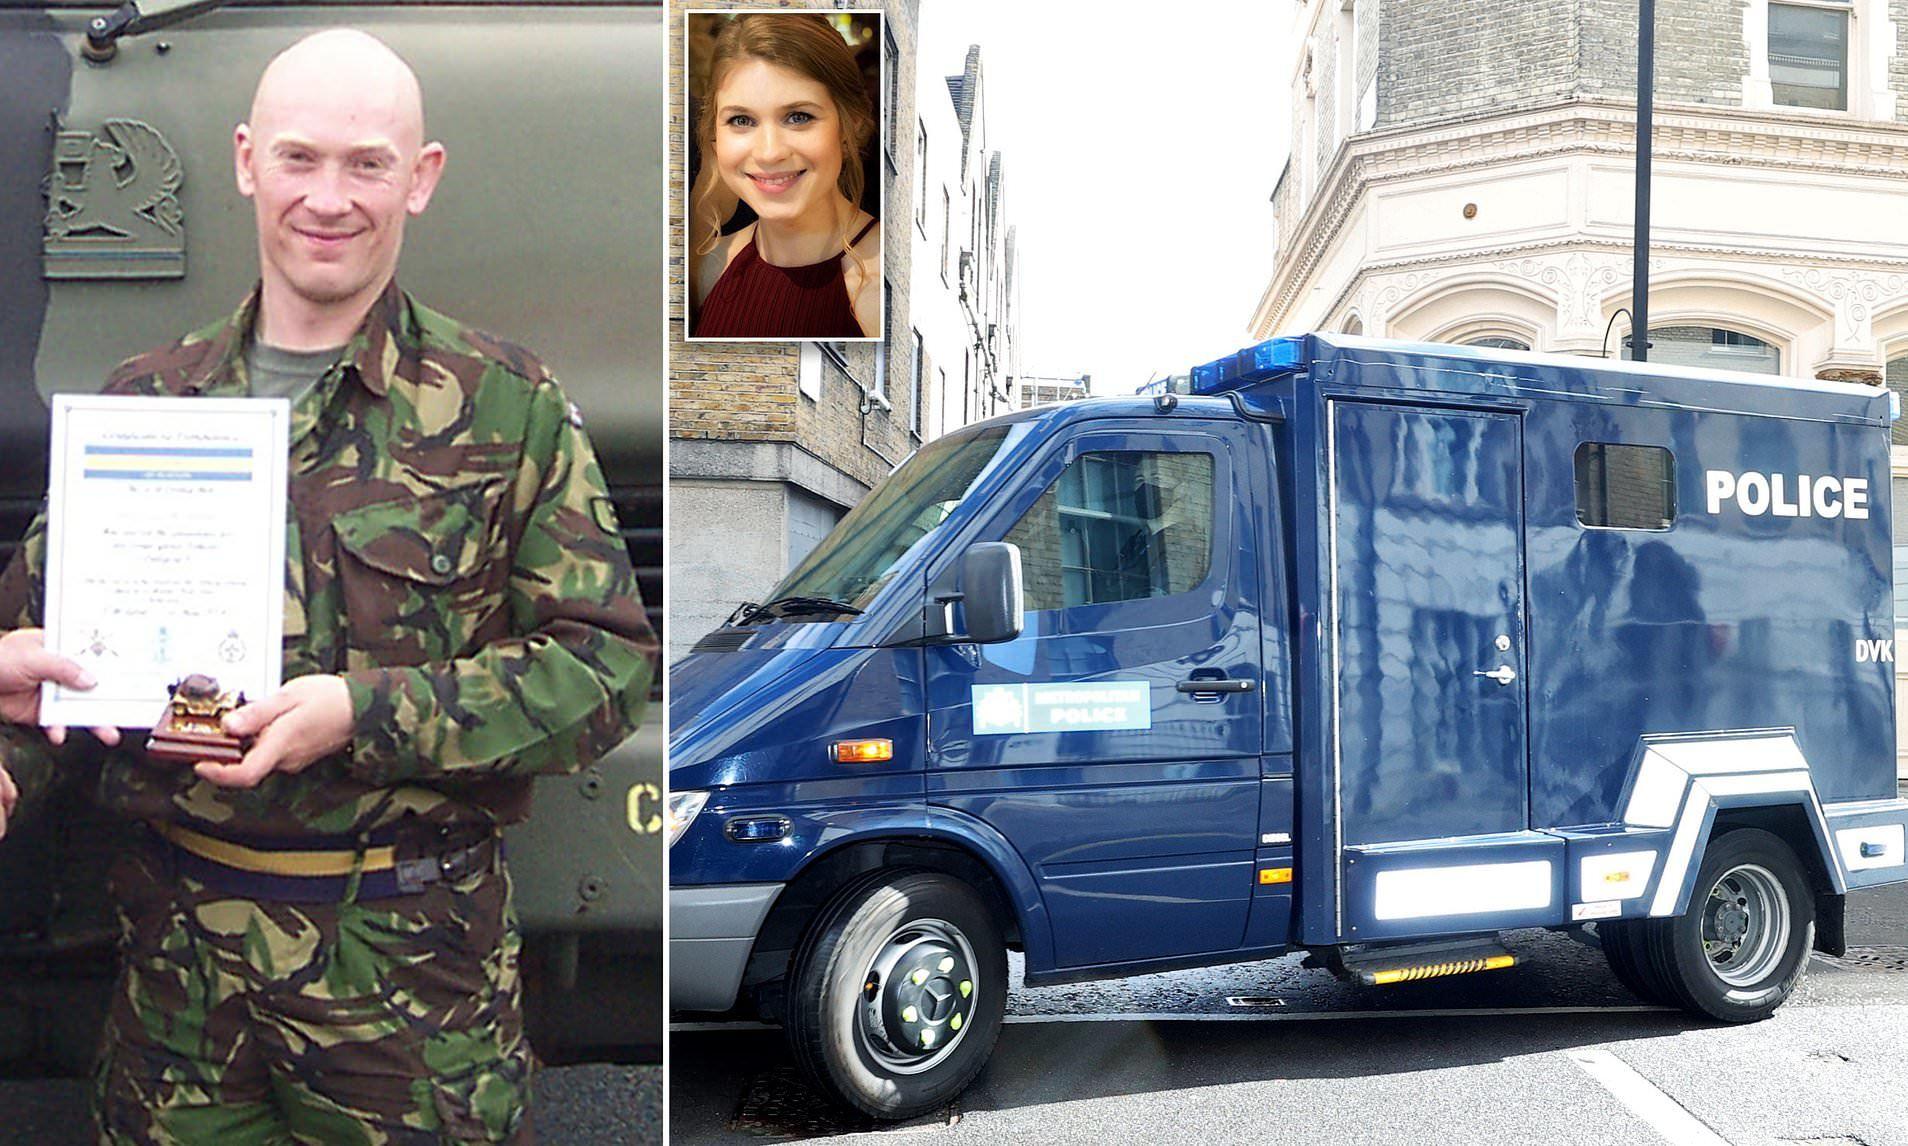 پلیس انگلیس؛ زیرتیغ رسوایی اخلاقی گسترده